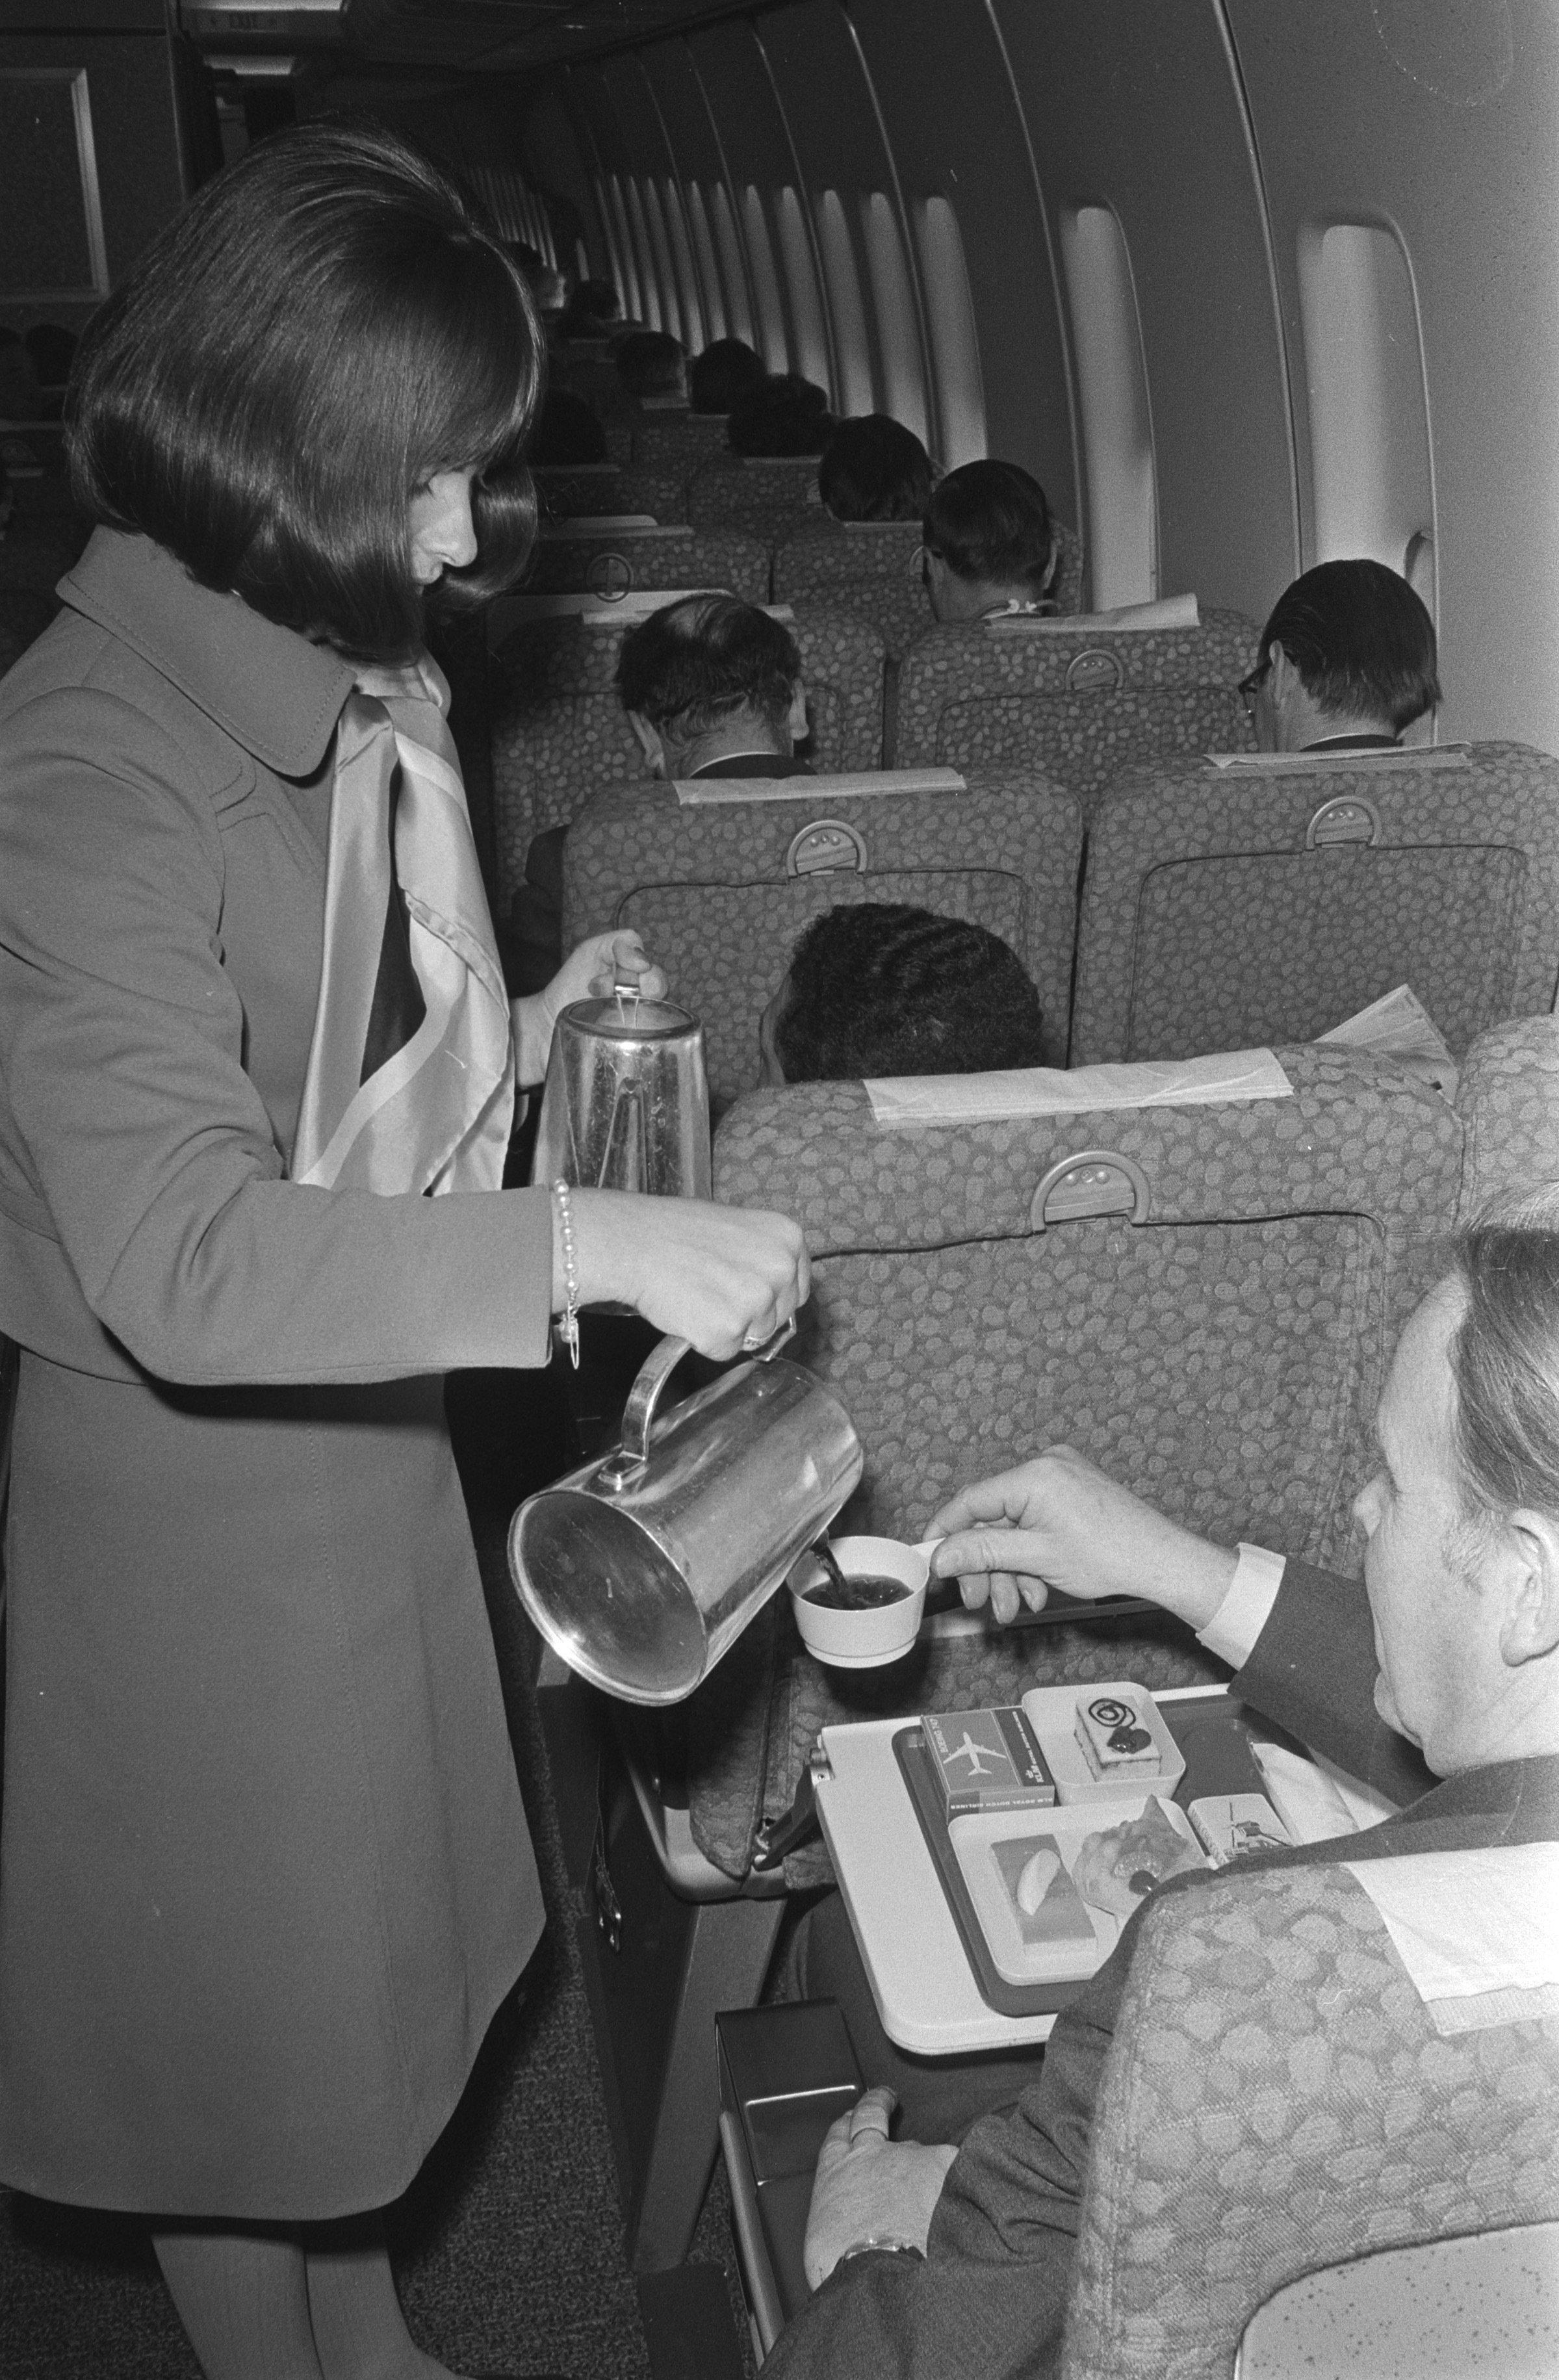 filevlucht met boeing 747 naar rome van schiphol interieur stewardess schenkt koff bestanddeelnr